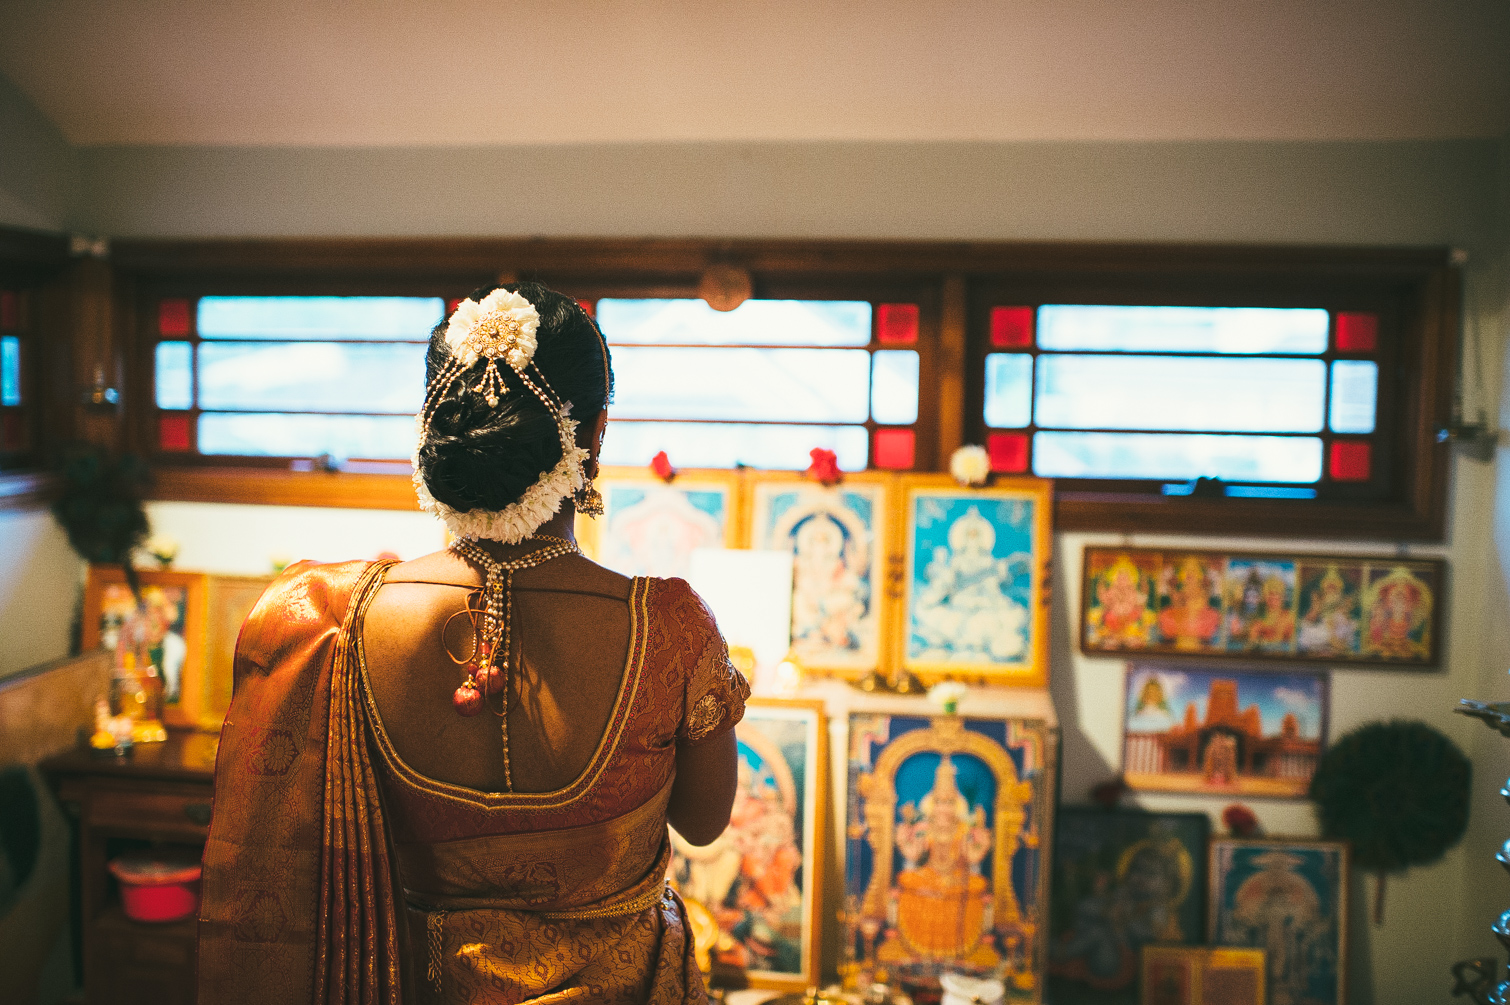 sri venkateswara temple wedding photography 7.jpg